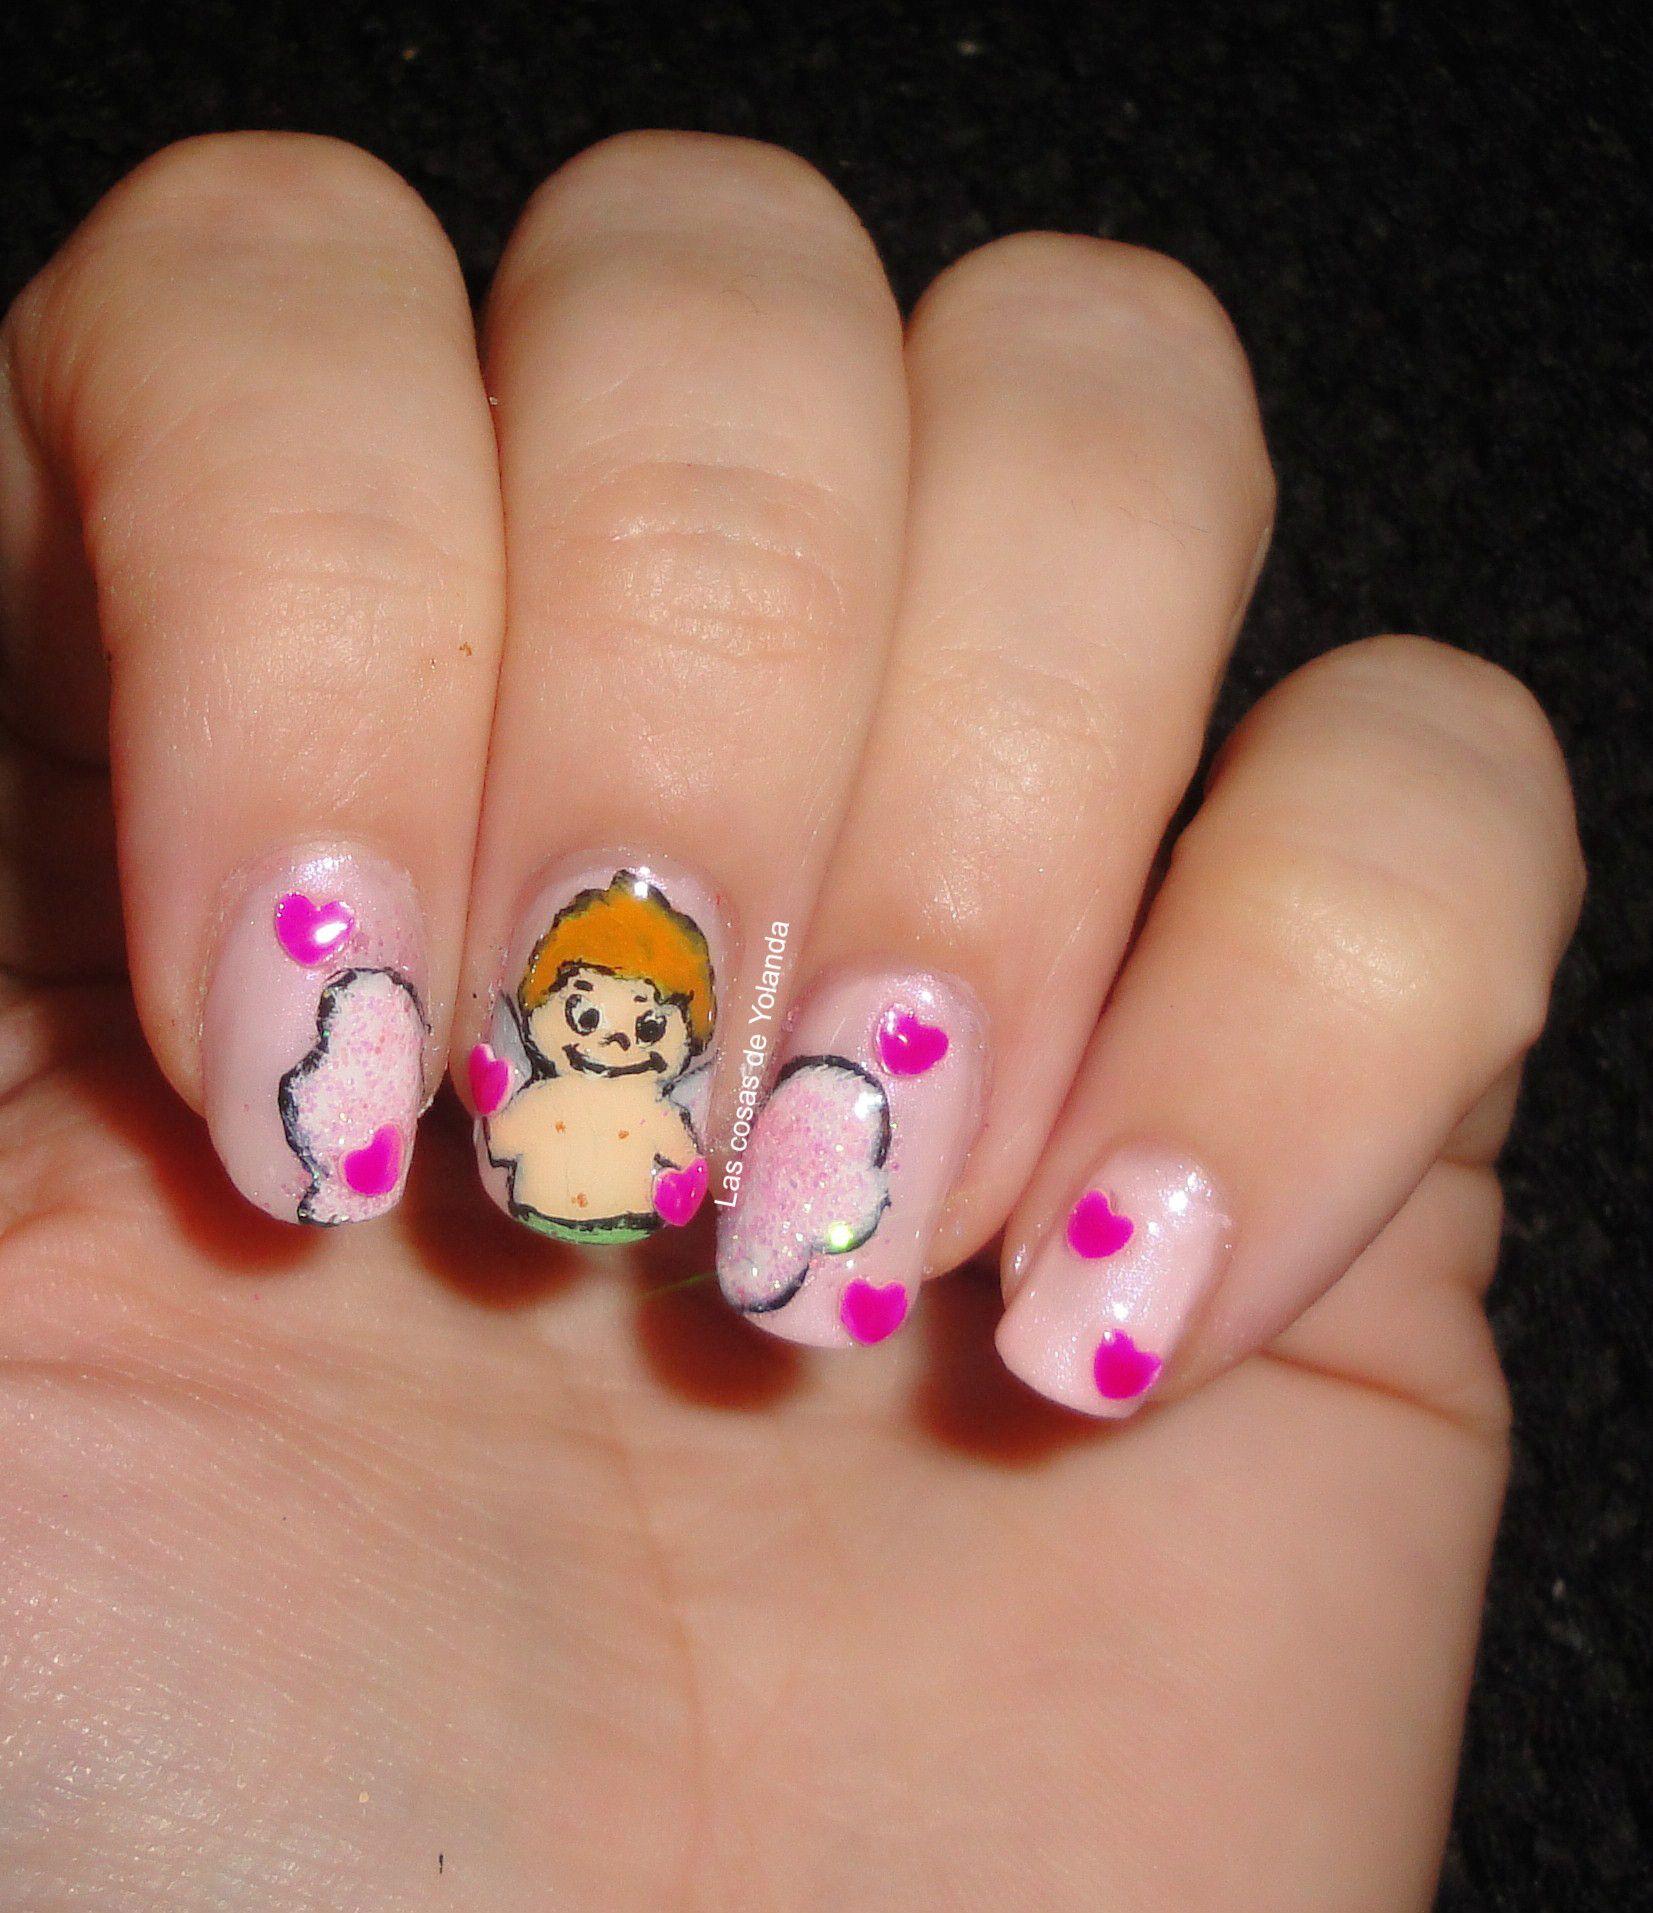 Cupid nail art nail art cupidocupido amor love nail art cupid nail art nail art cupidocupido amor love prinsesfo Choice Image